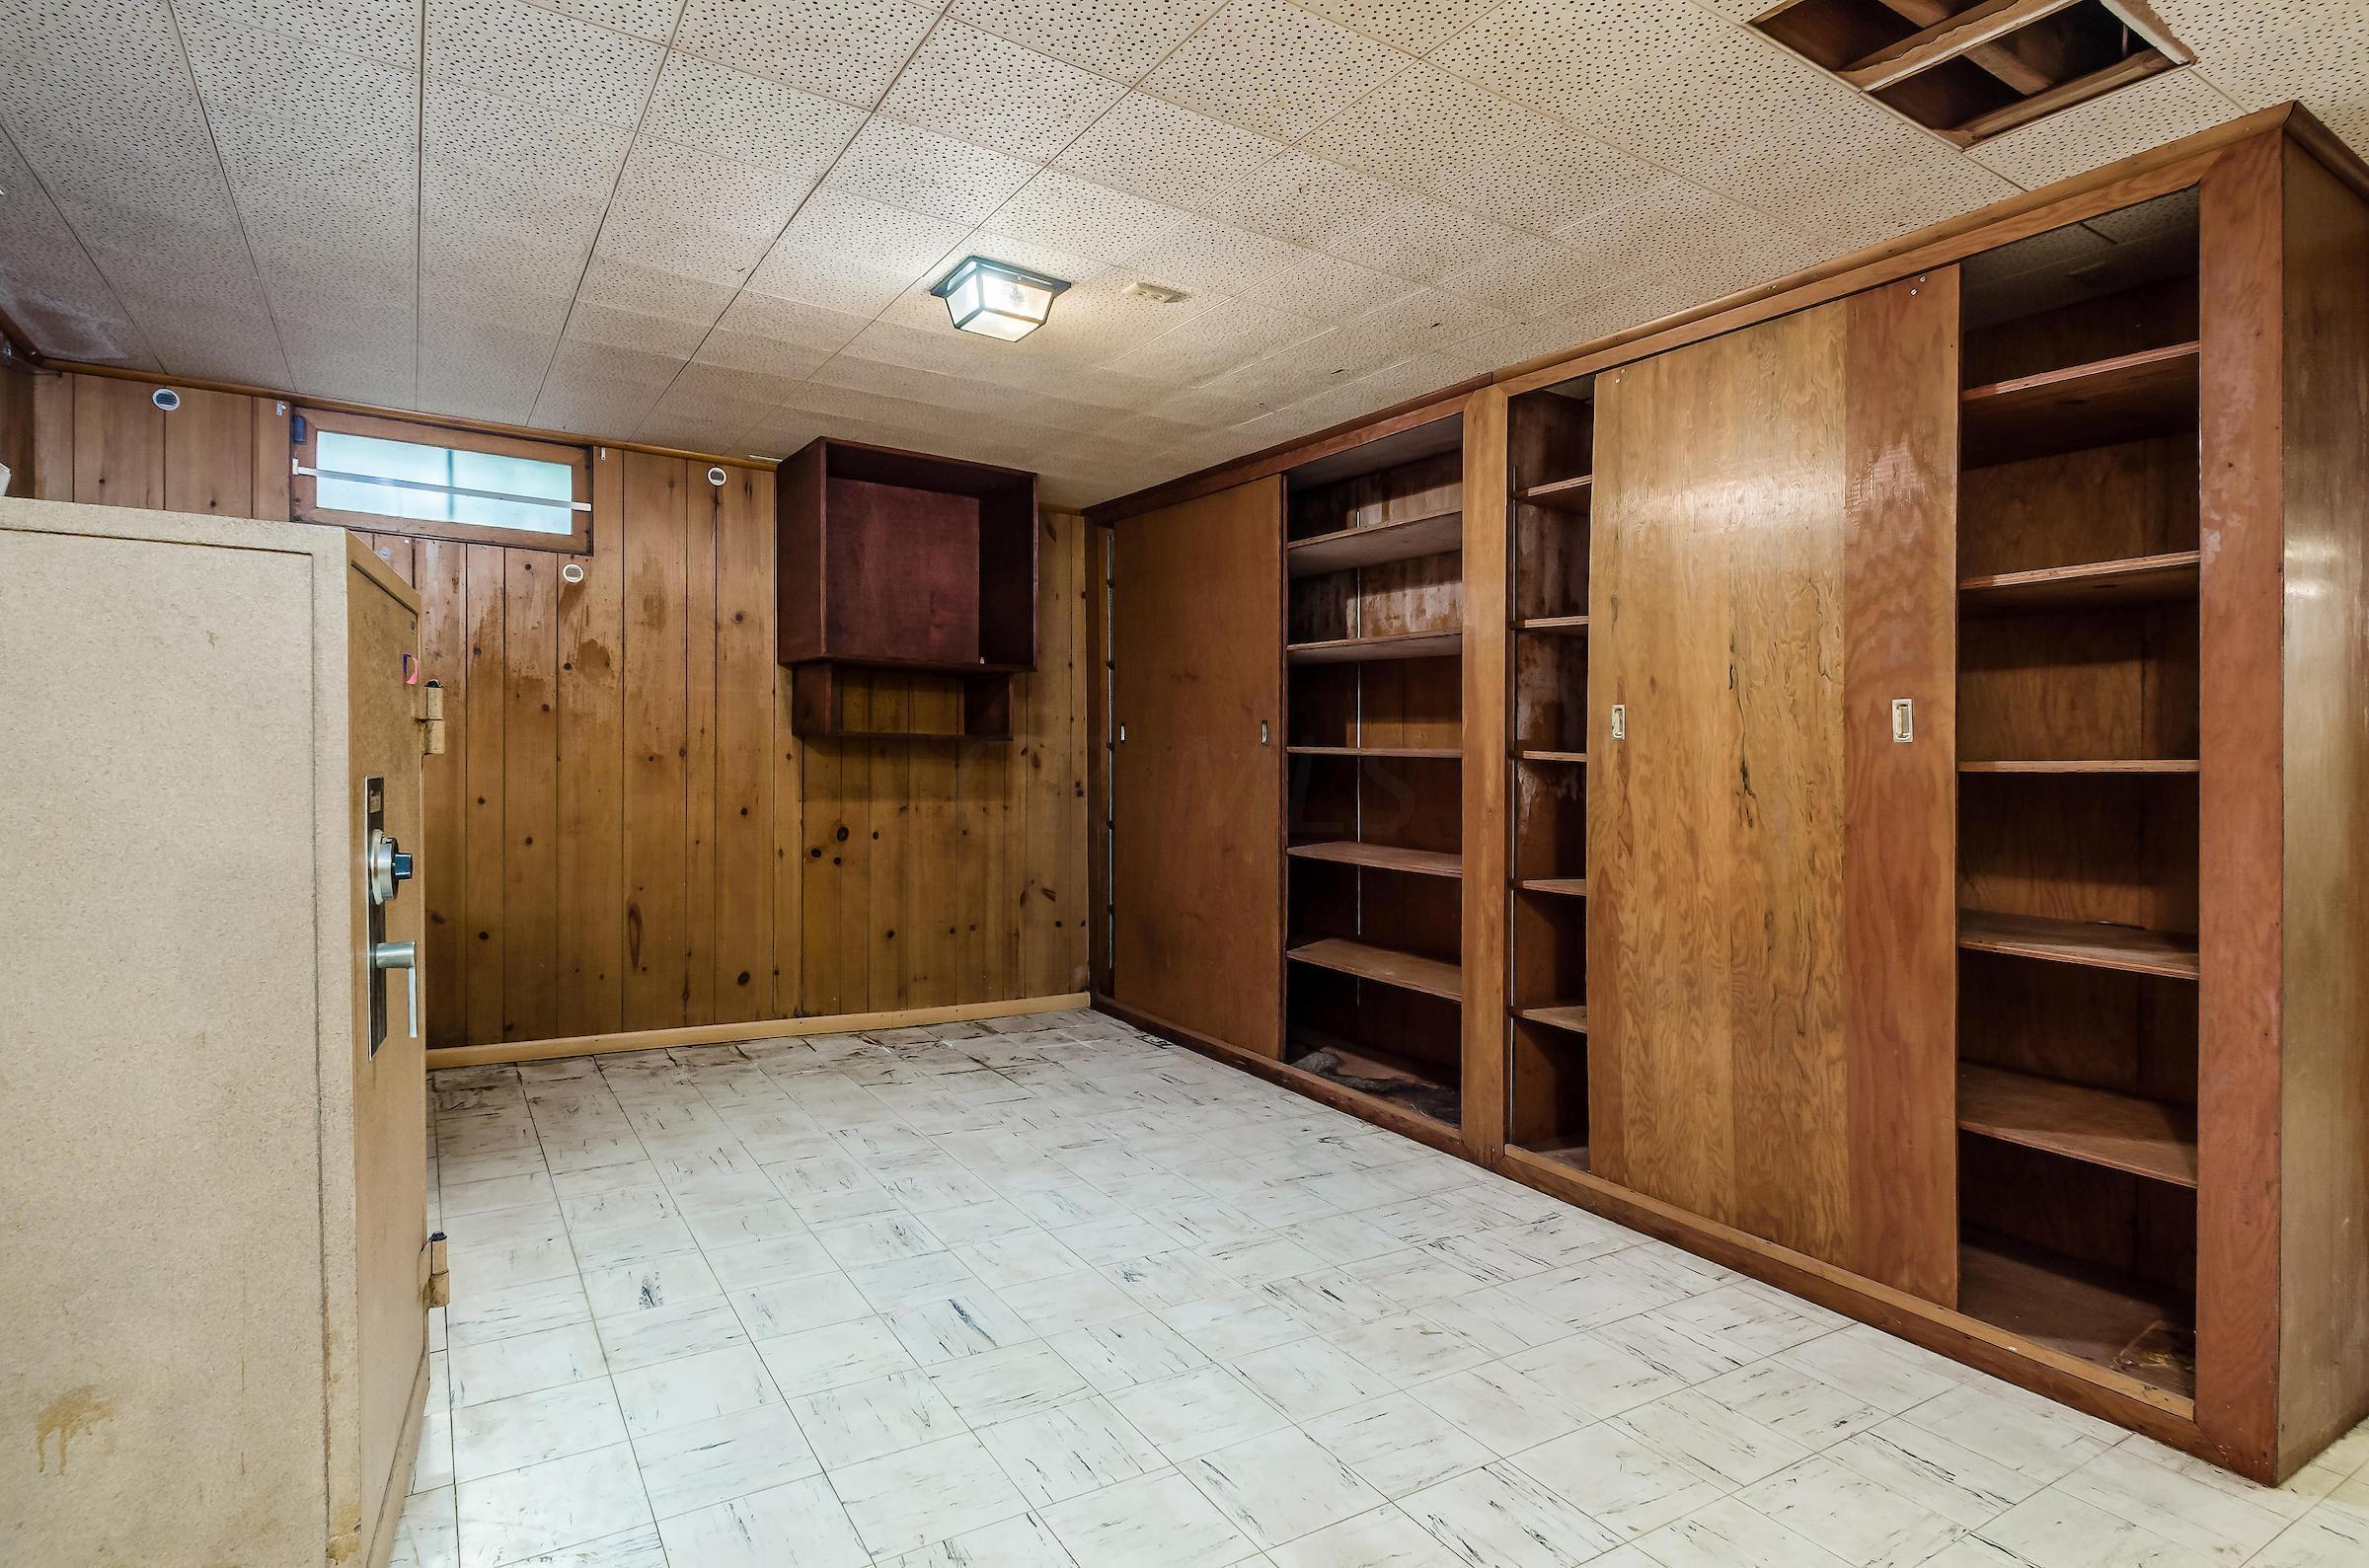 599 Glenmont Avenue, Columbus, Ohio 43214, 4 Bedrooms Bedrooms, ,3 BathroomsBathrooms,Residential,For Sale,Glenmont,220019036